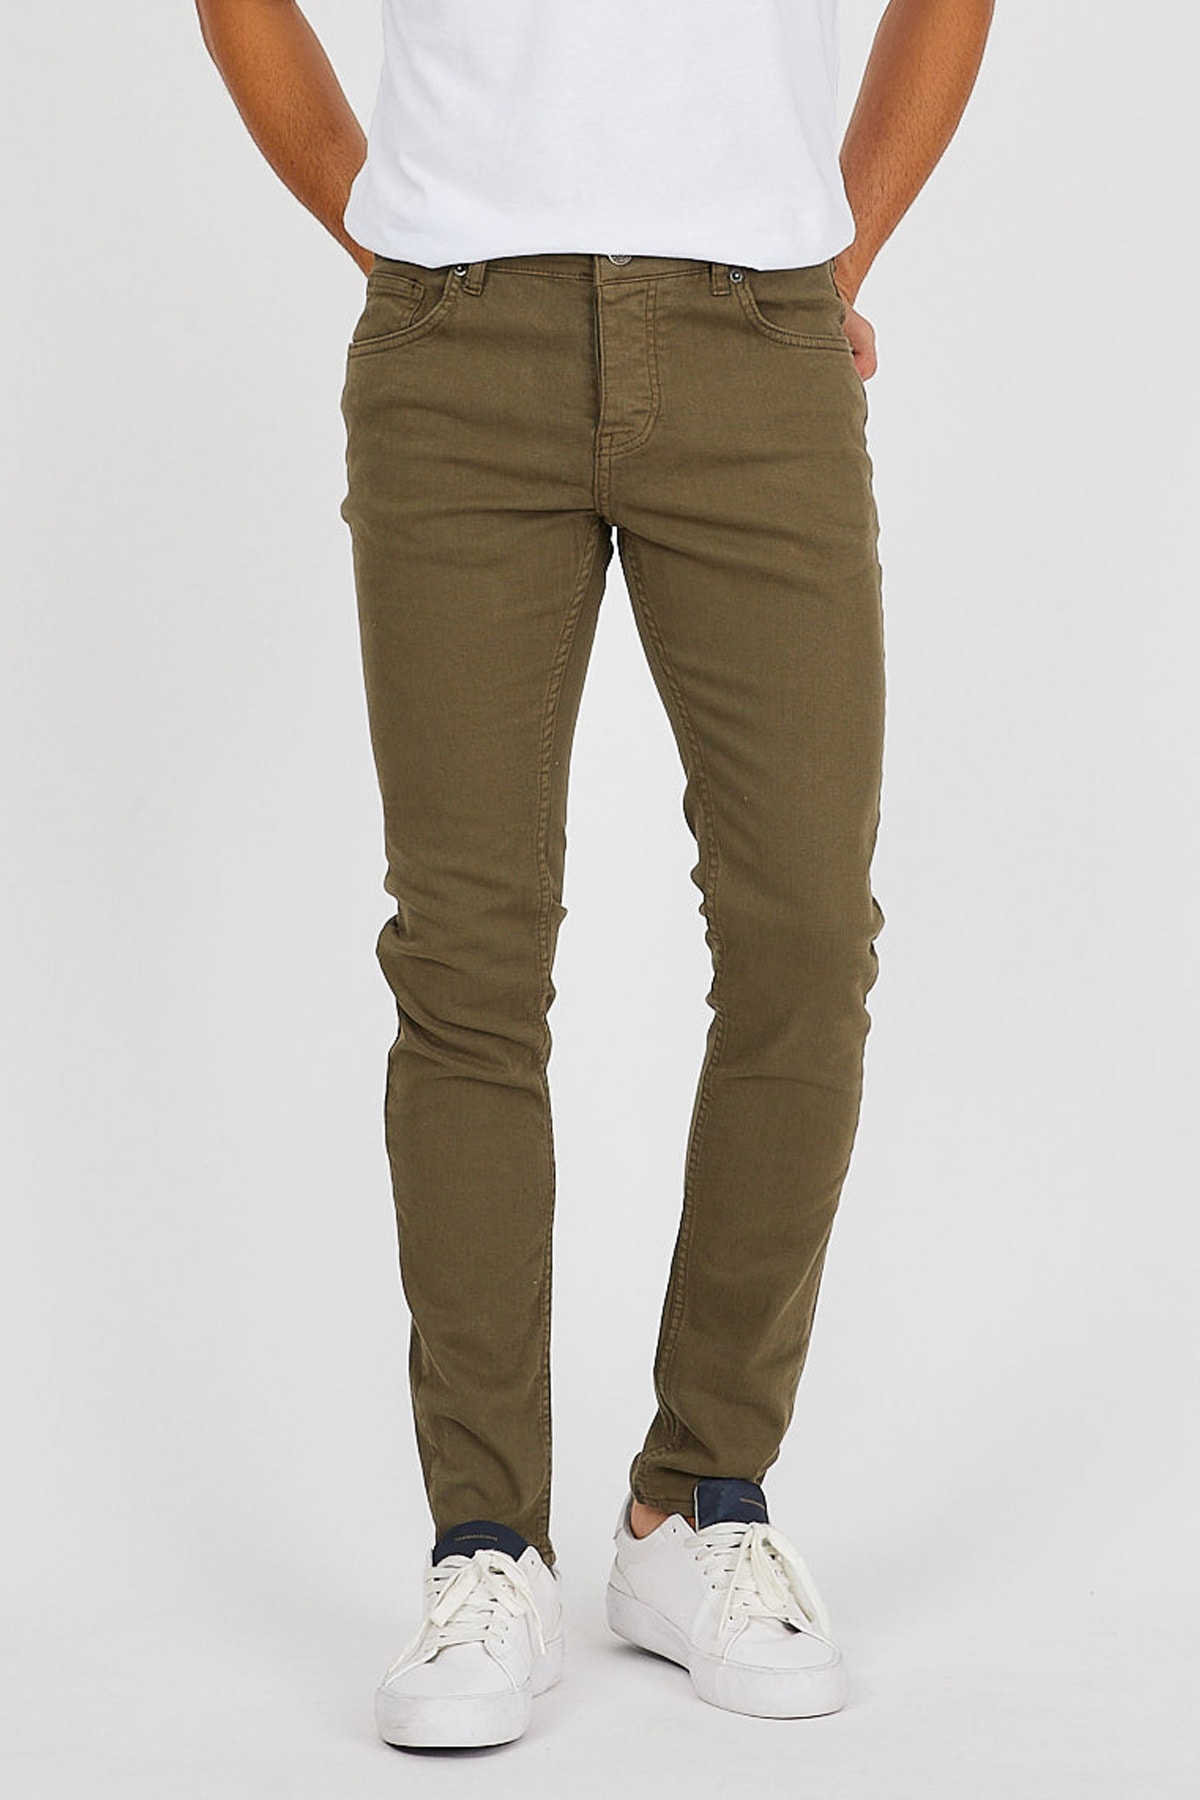 Denim Republic Erkek Haki Slim Fit Pantolon 1